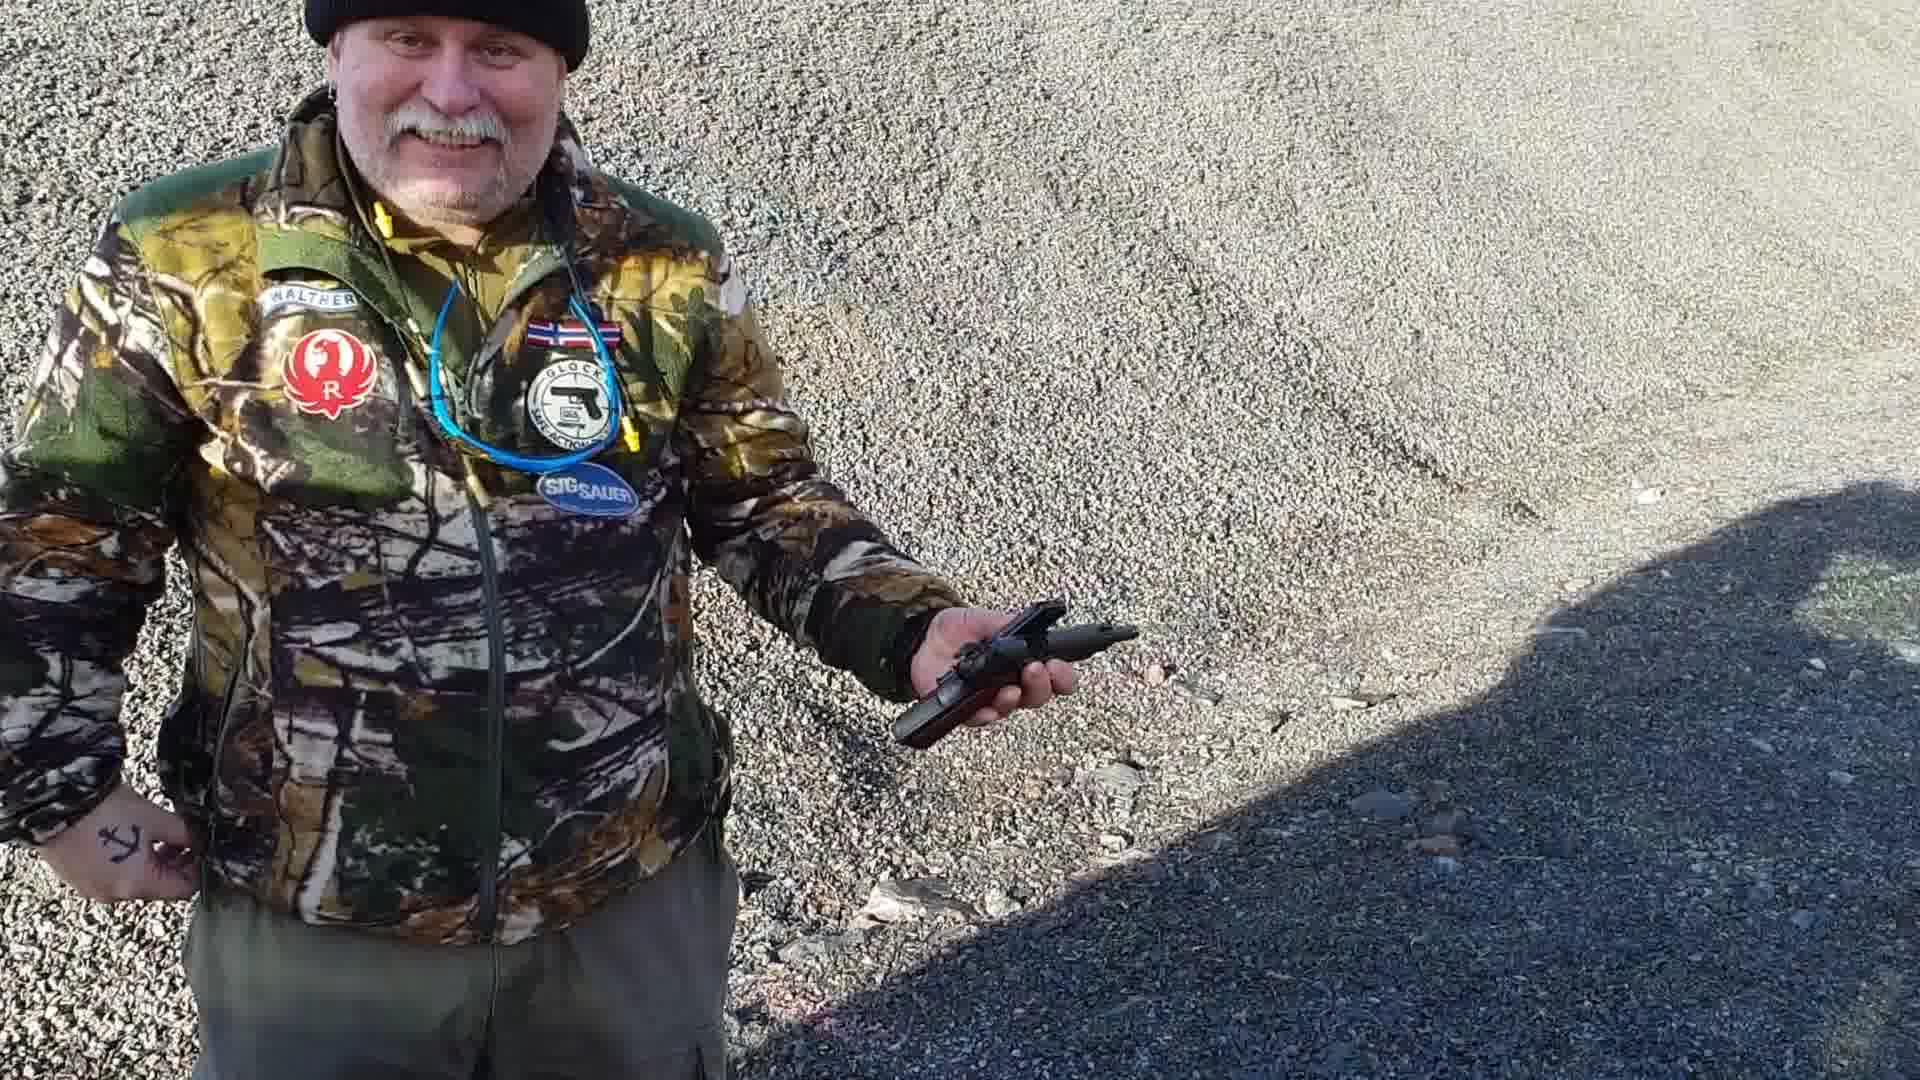 Gammle Madsen tester ut fin Pistolen sin  :O